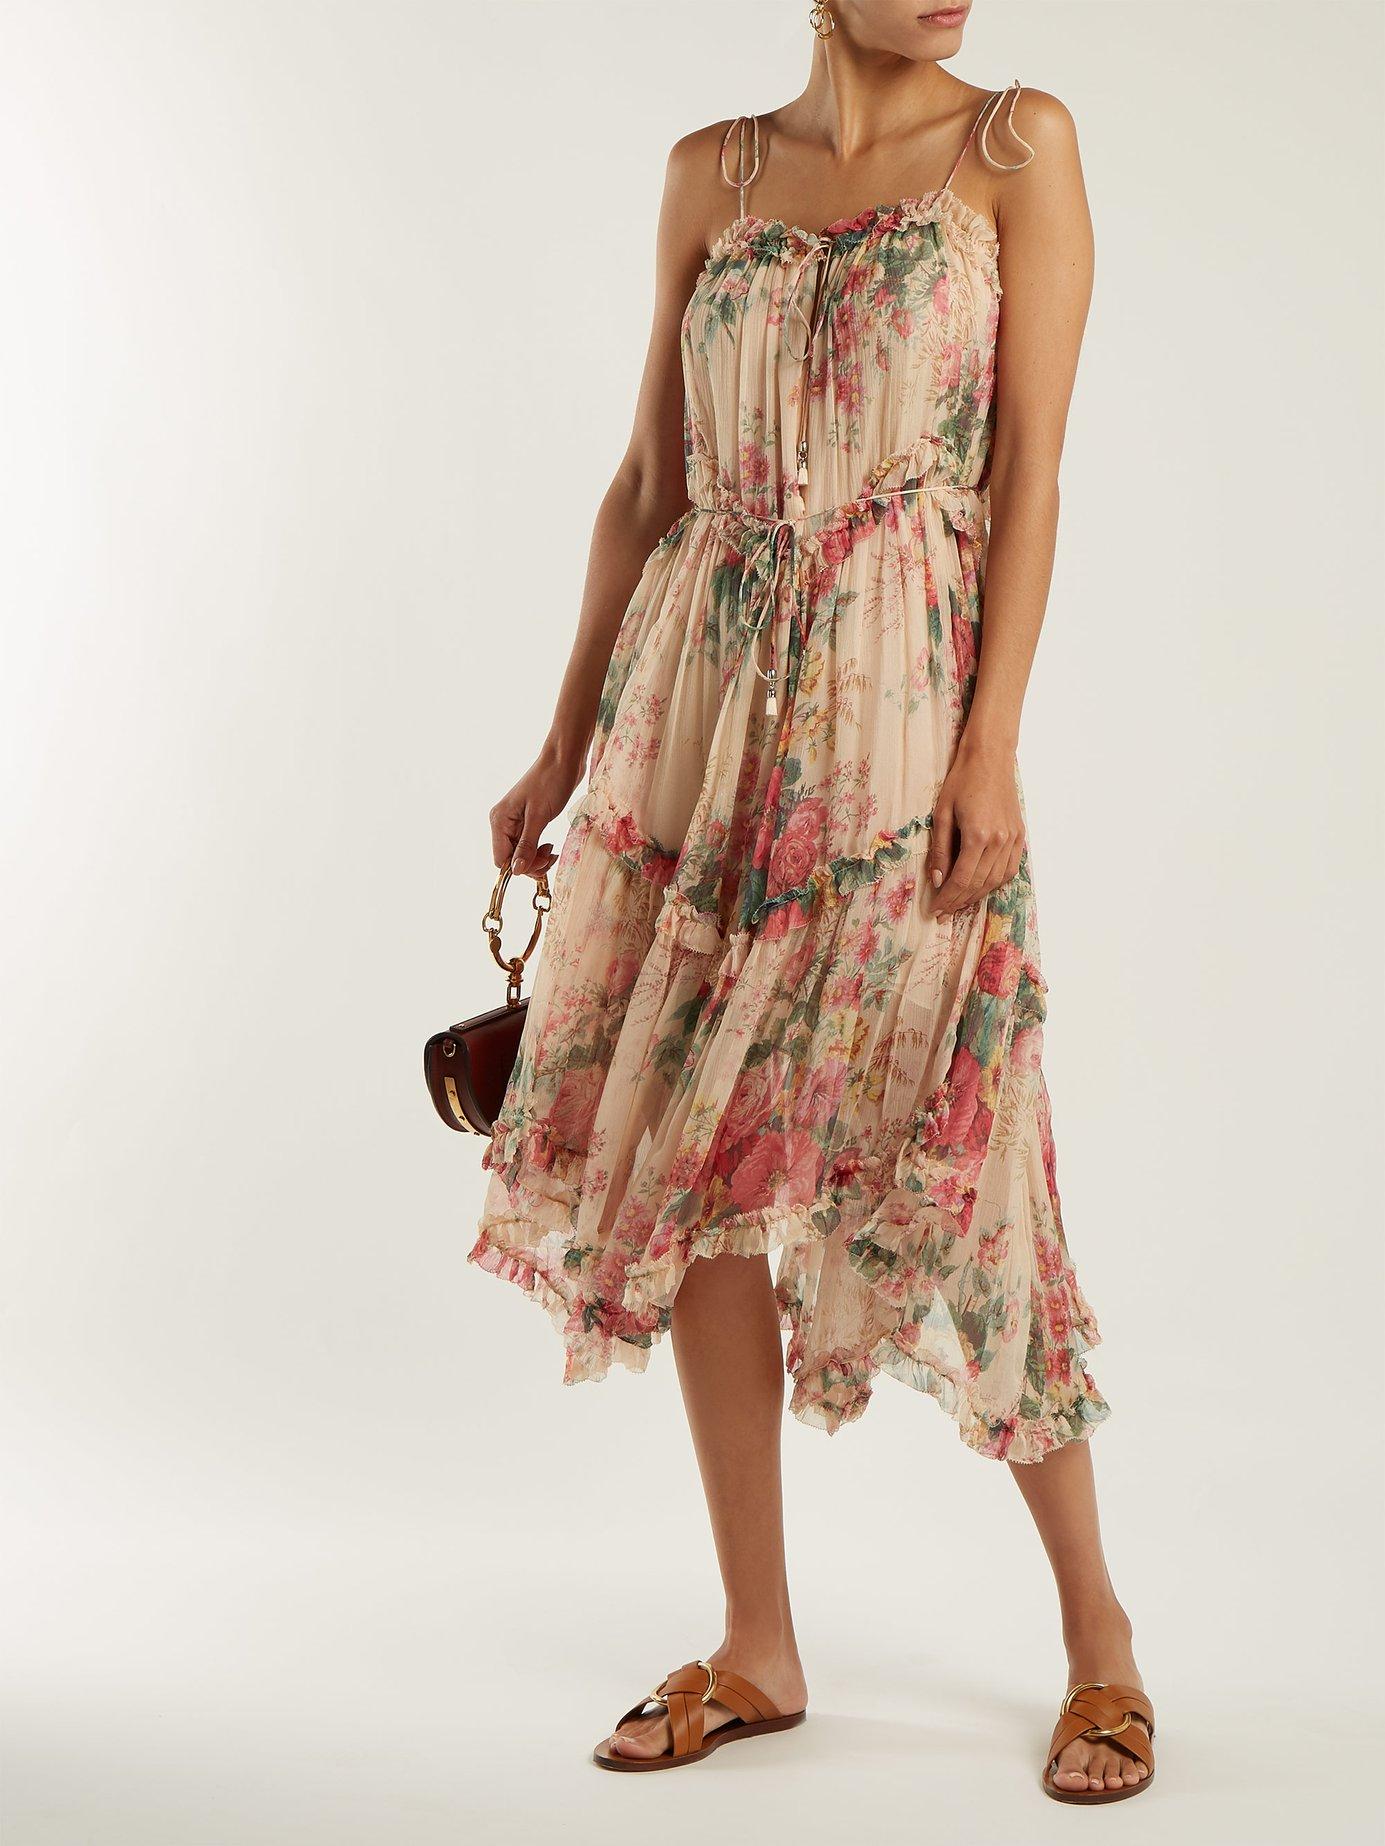 Laelia floral-print silk dress by Zimmermann